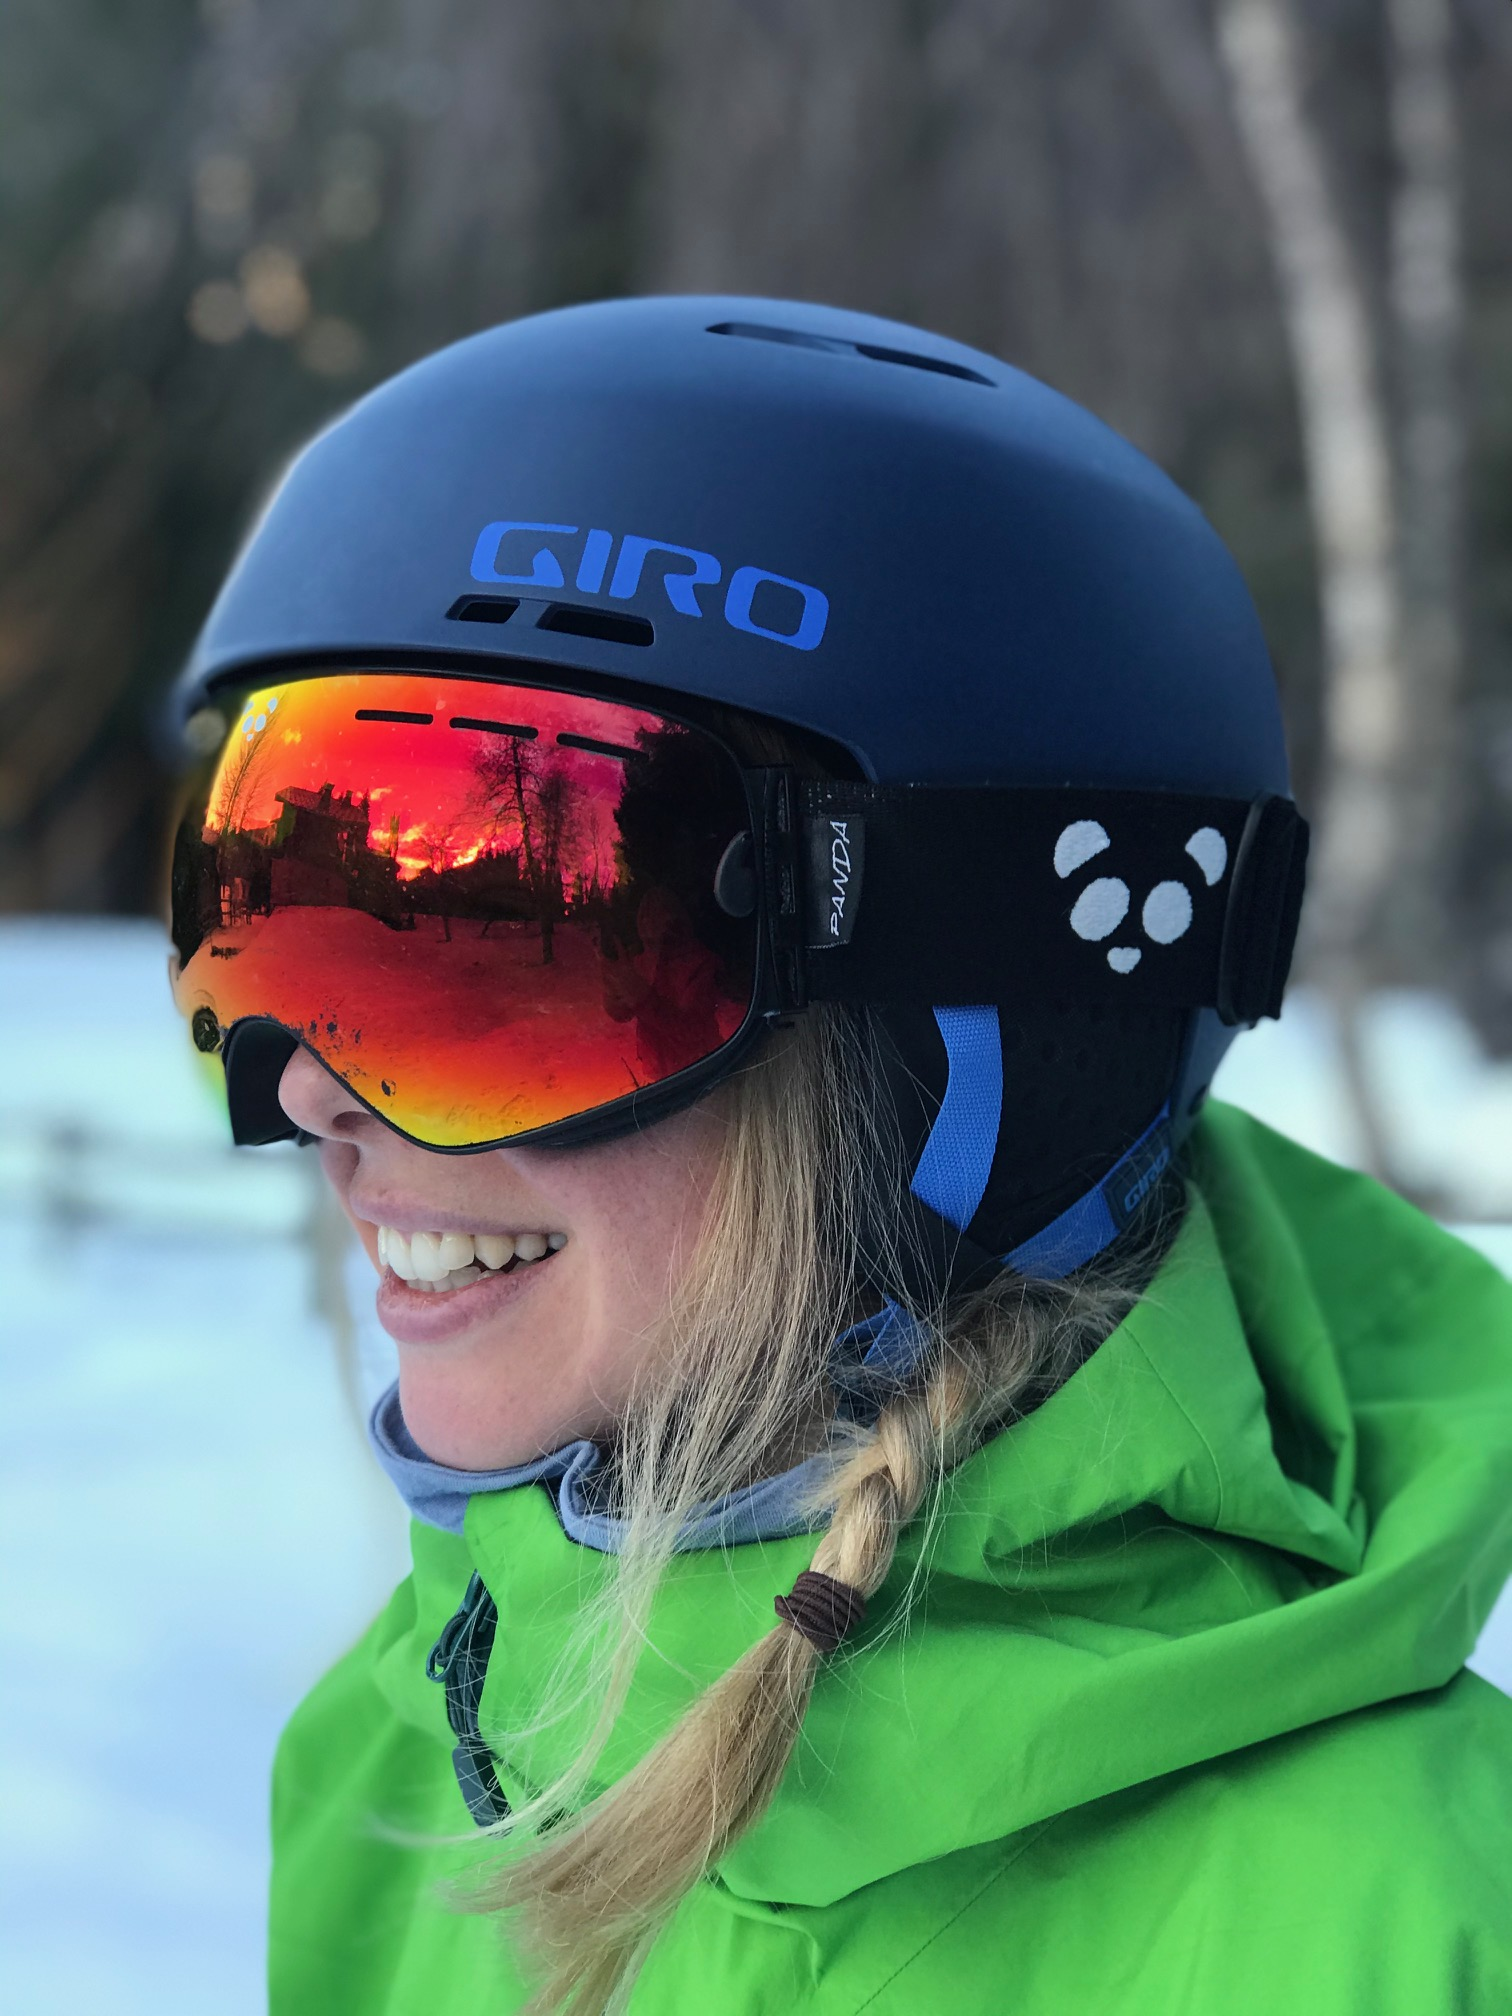 Goggles Under Helmet : goggles, under, helmet, TRIED, TESTED:, EMERGE, HELMET, Fall-Line, Skiing